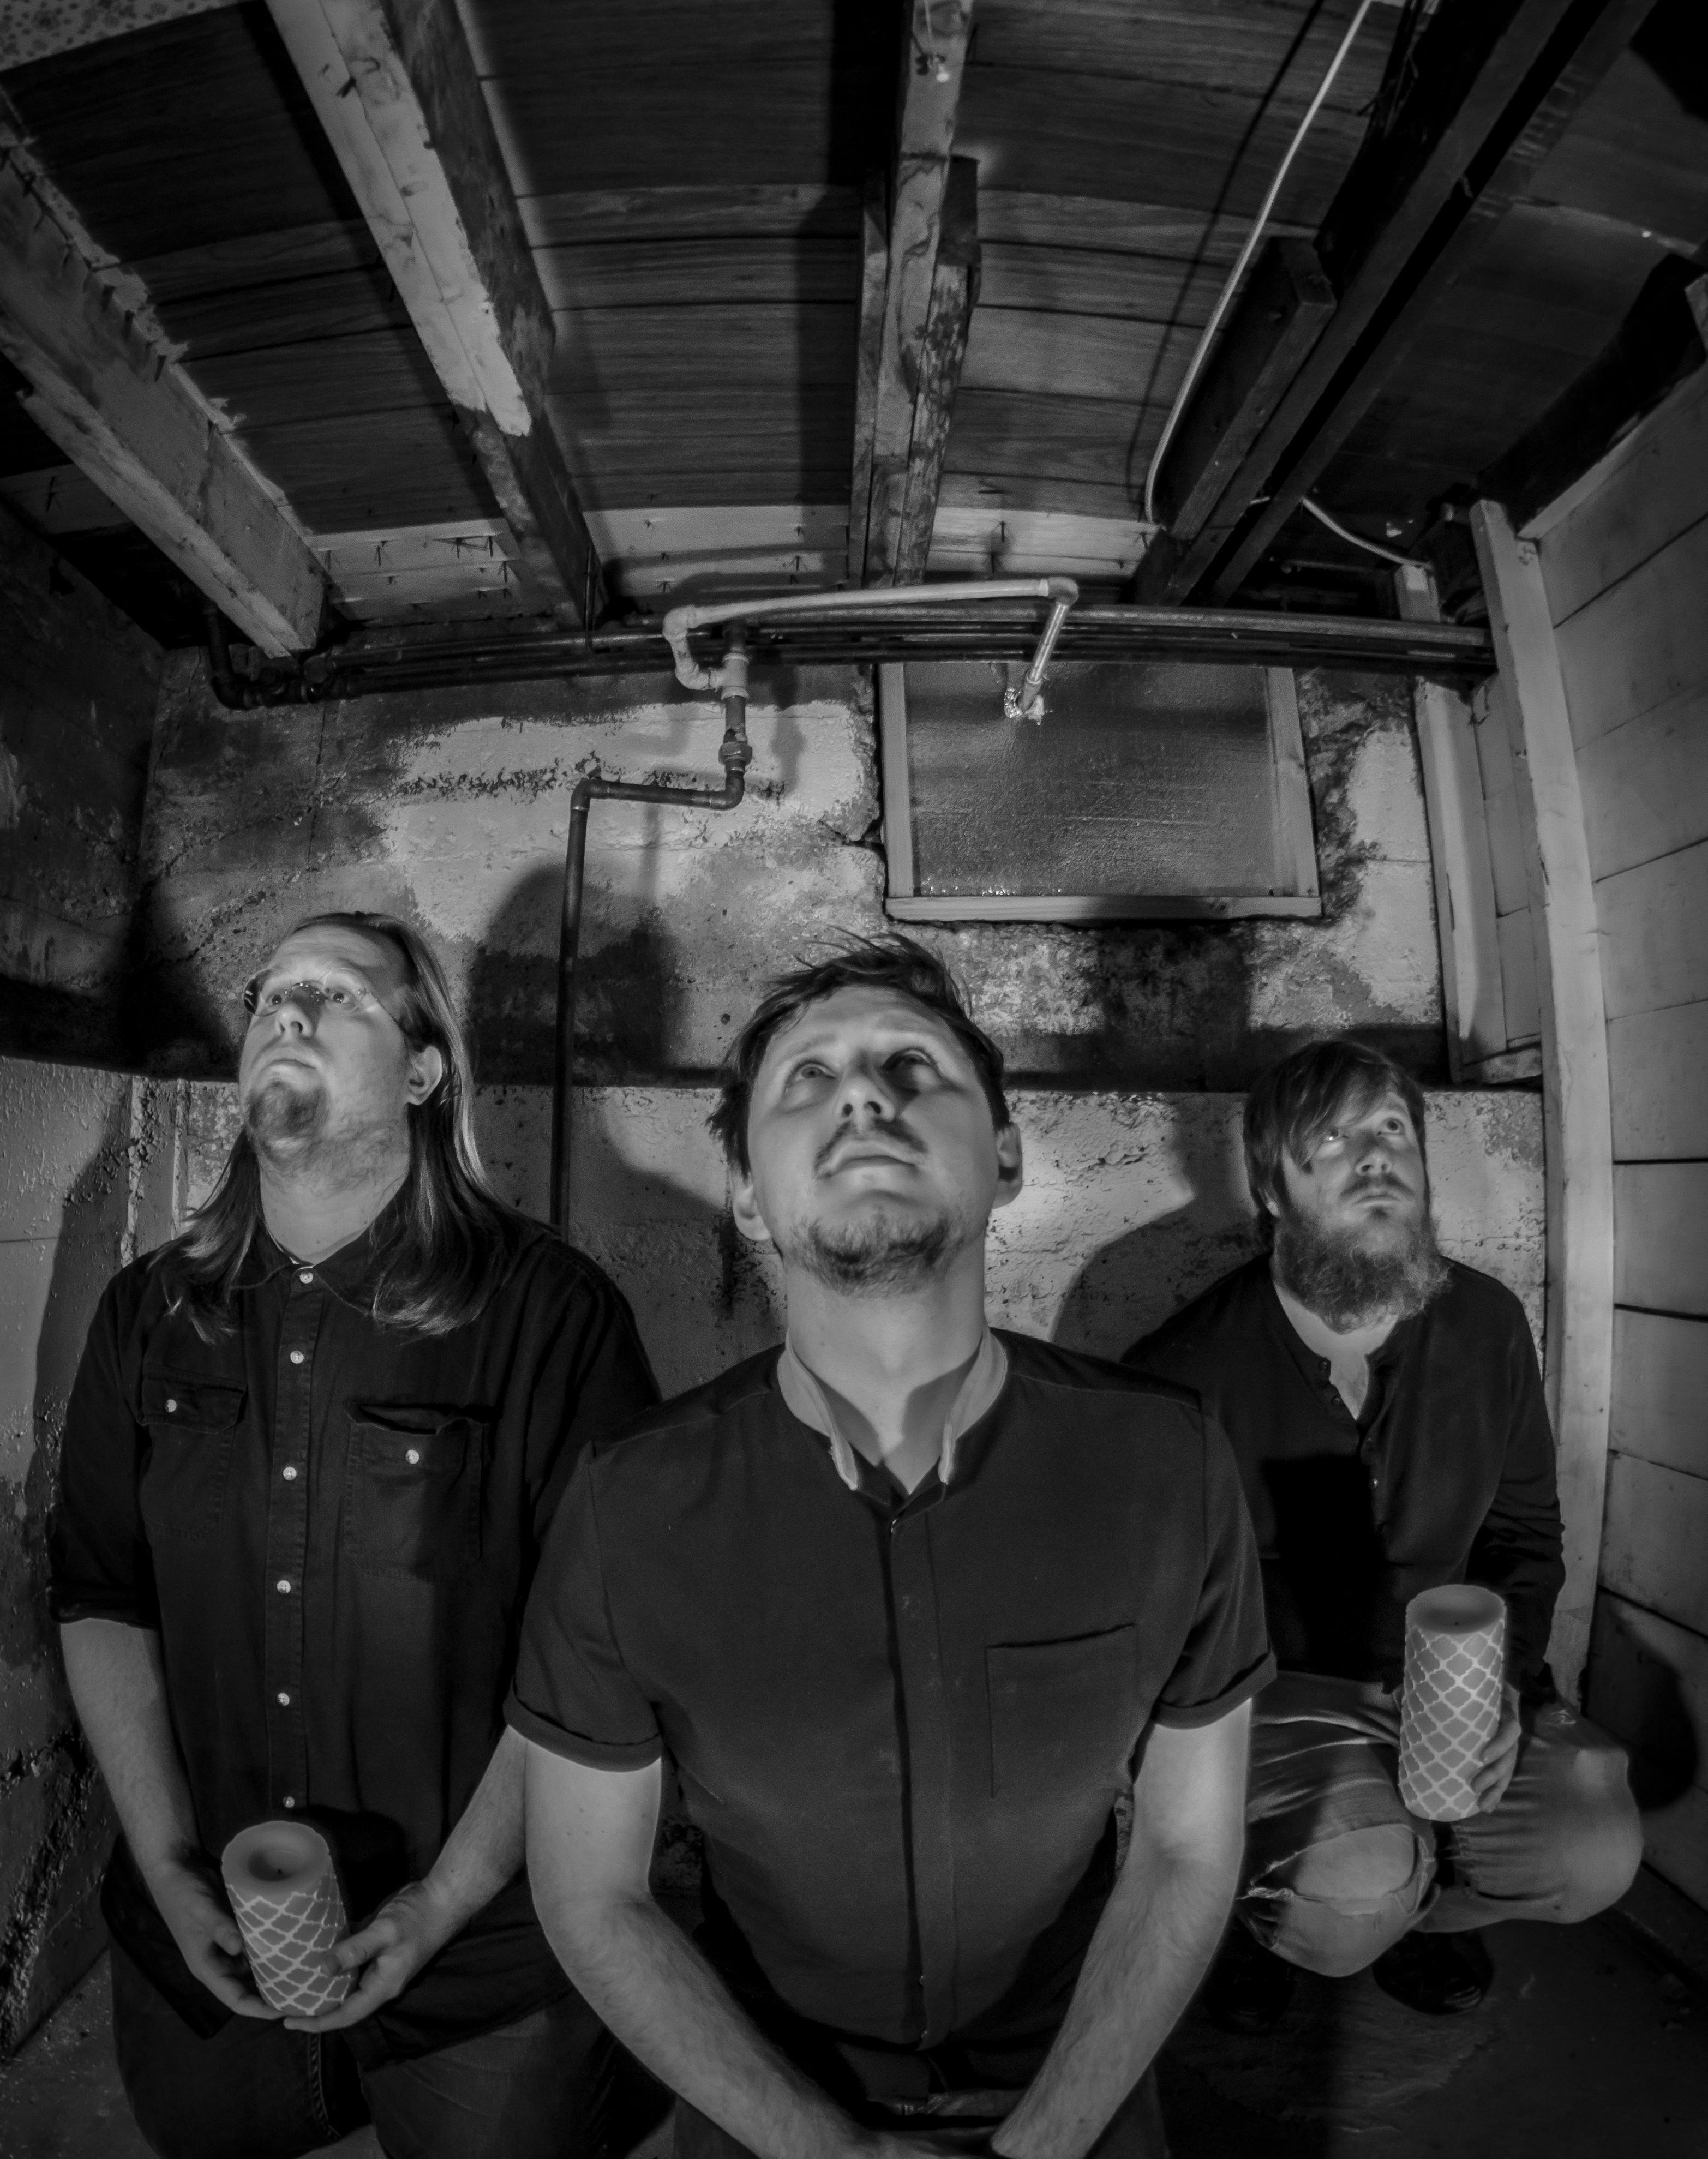 (L–R) Nicholas Allen, Chris Fallo and Marz Samuel Leizureman pose reverently. Photo: Randy Roberts